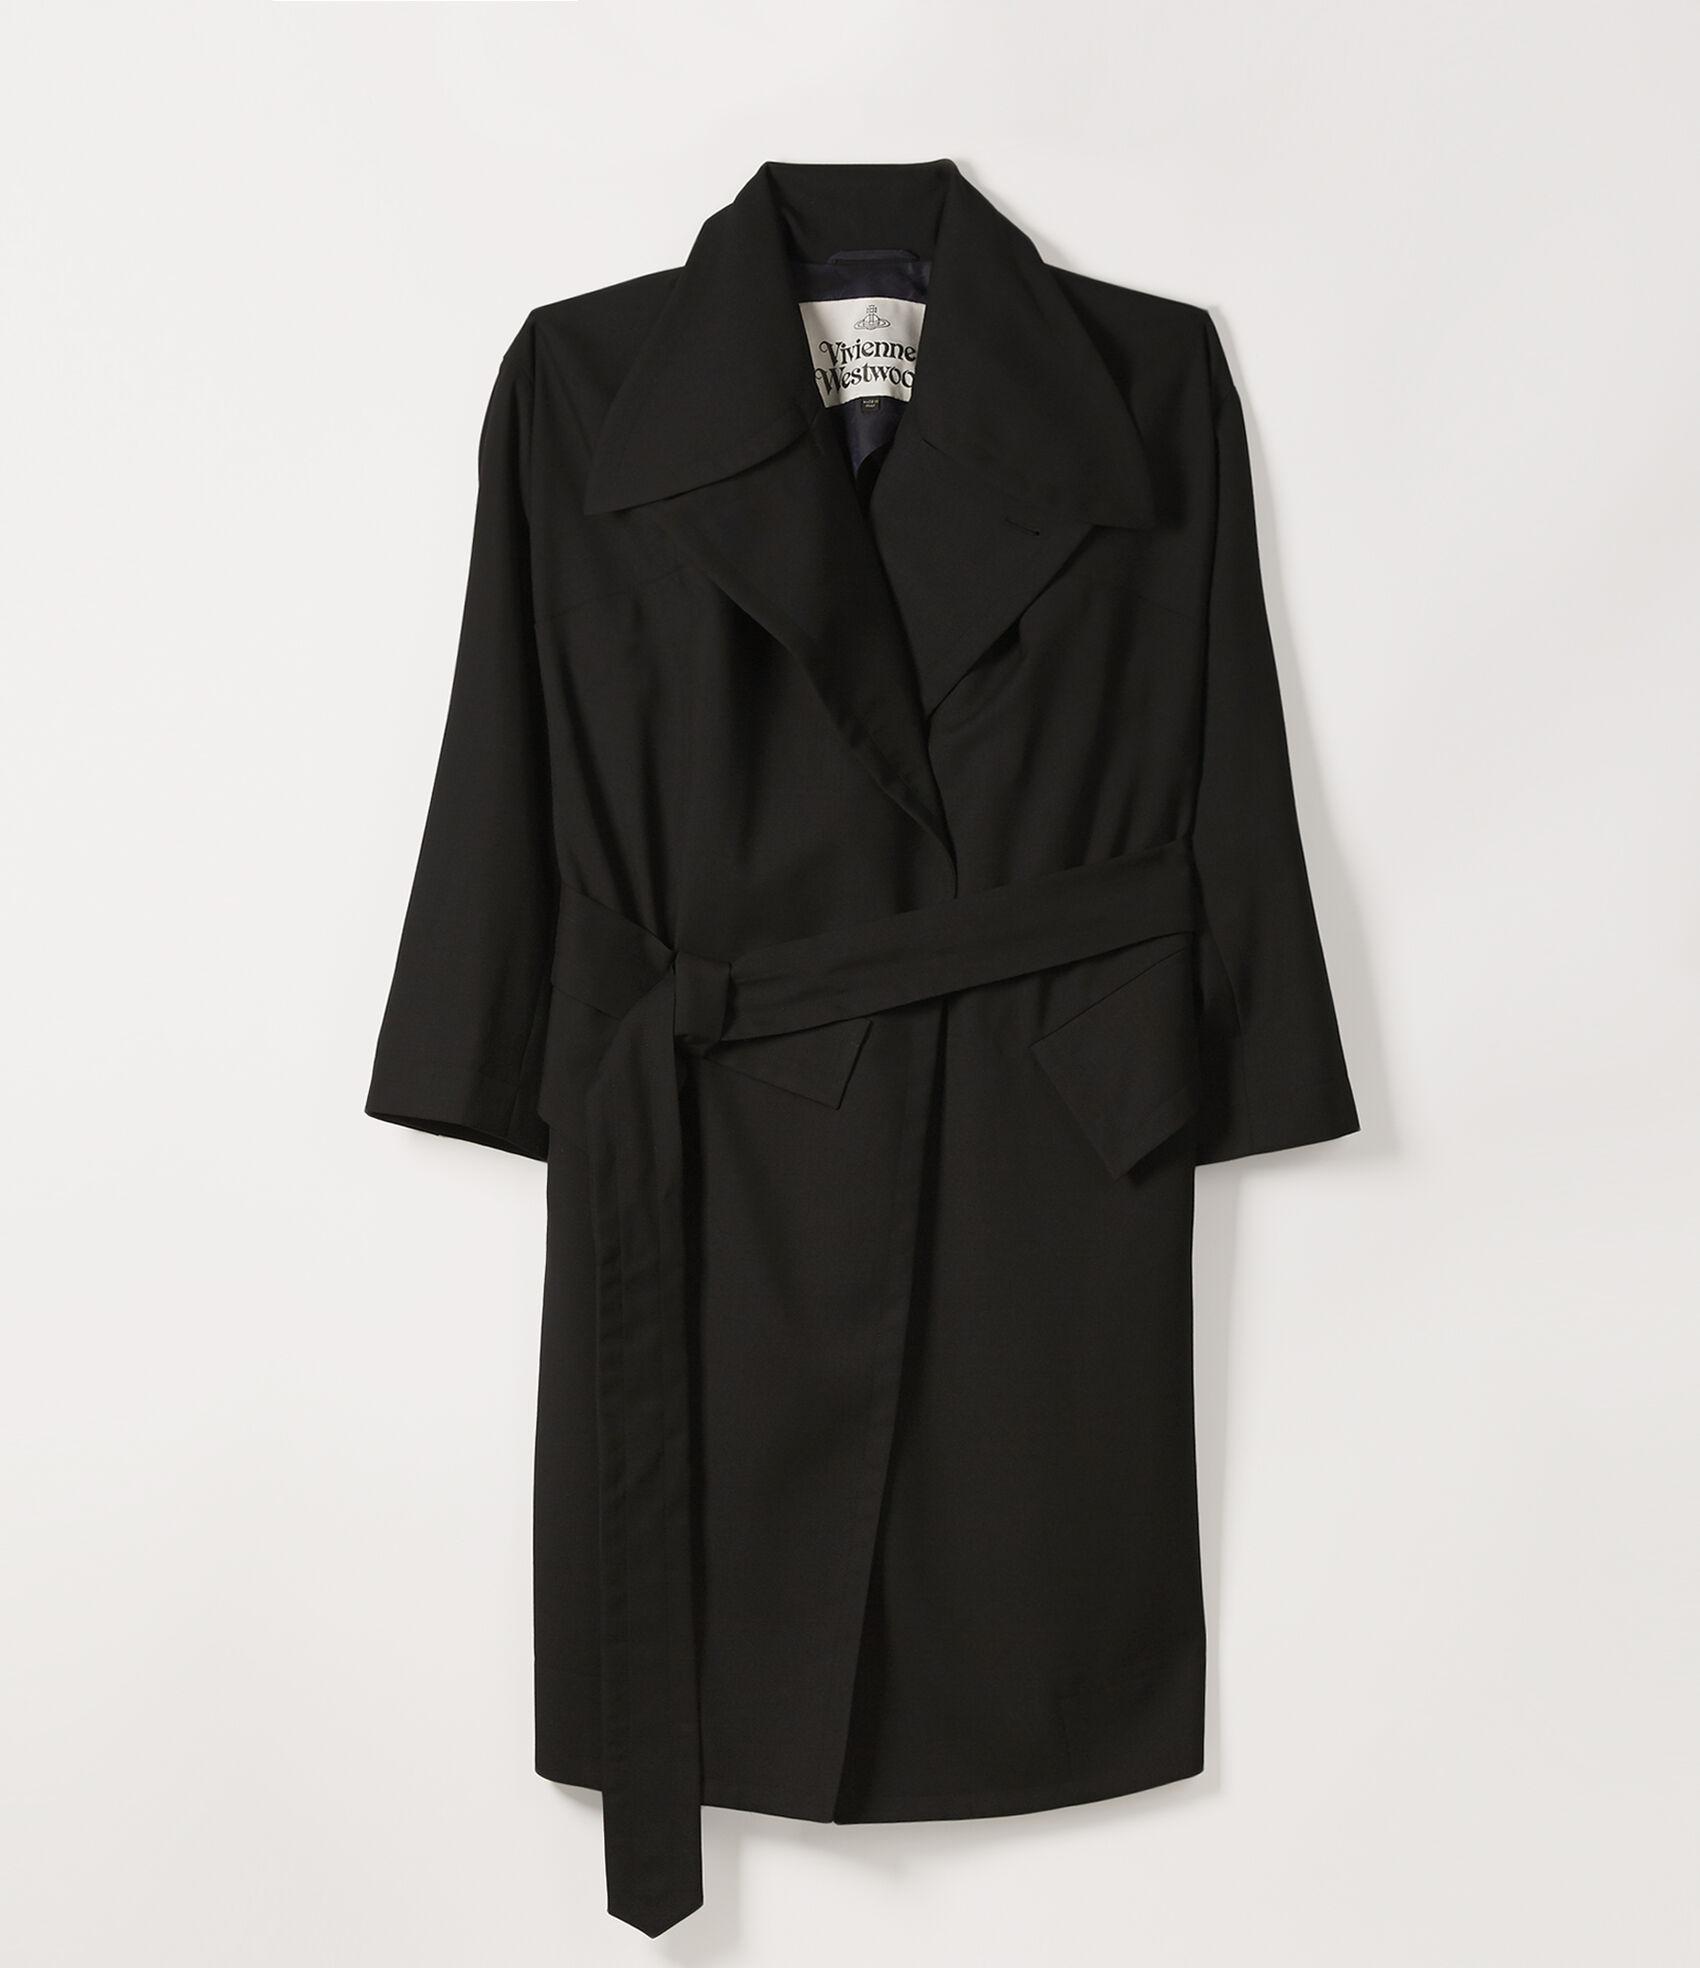 Wilma Wrap Coat in Black from Vivienne Westwood